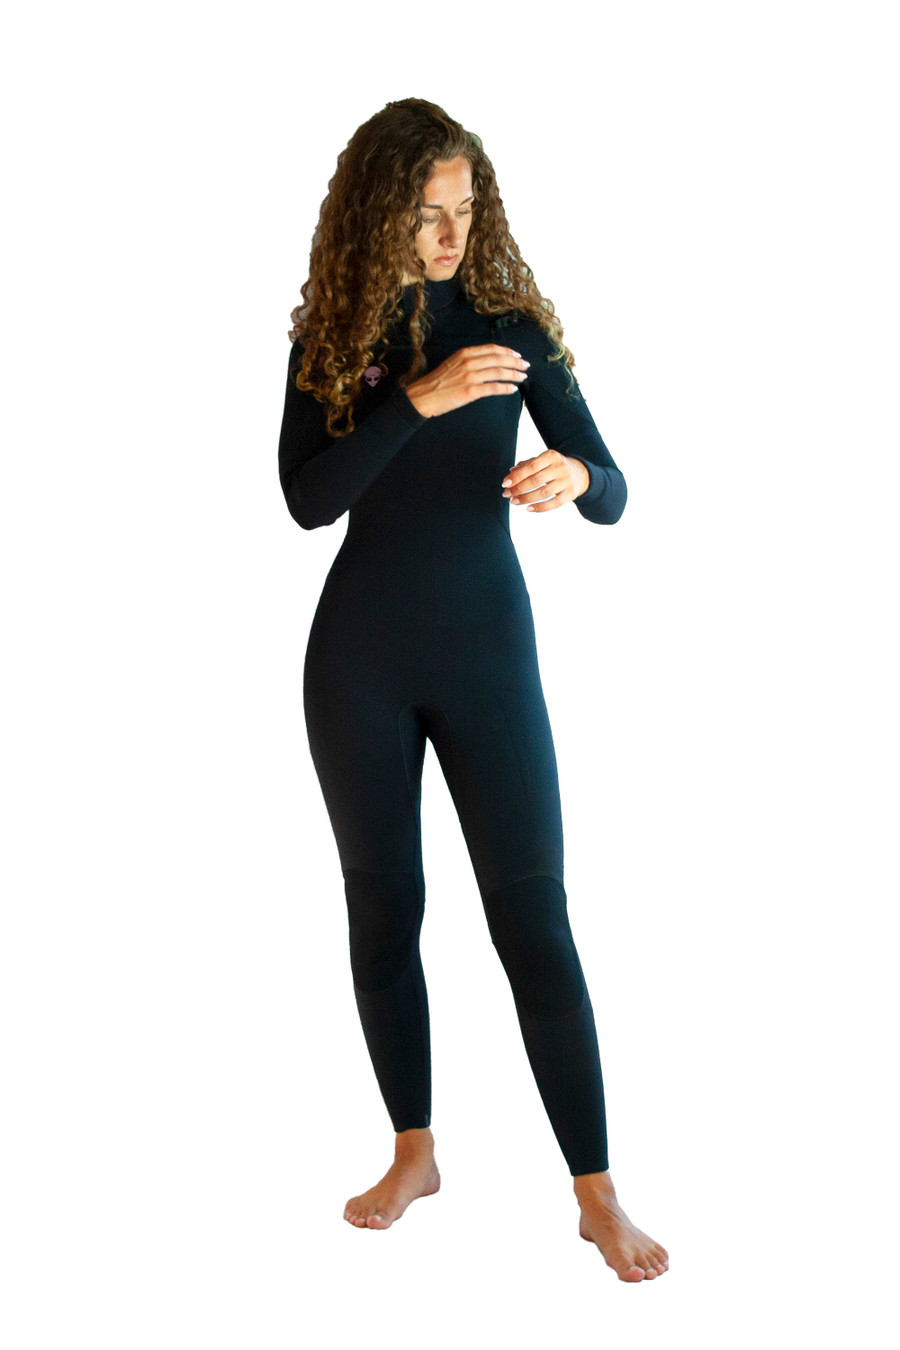 Slant zip womens wetsuit